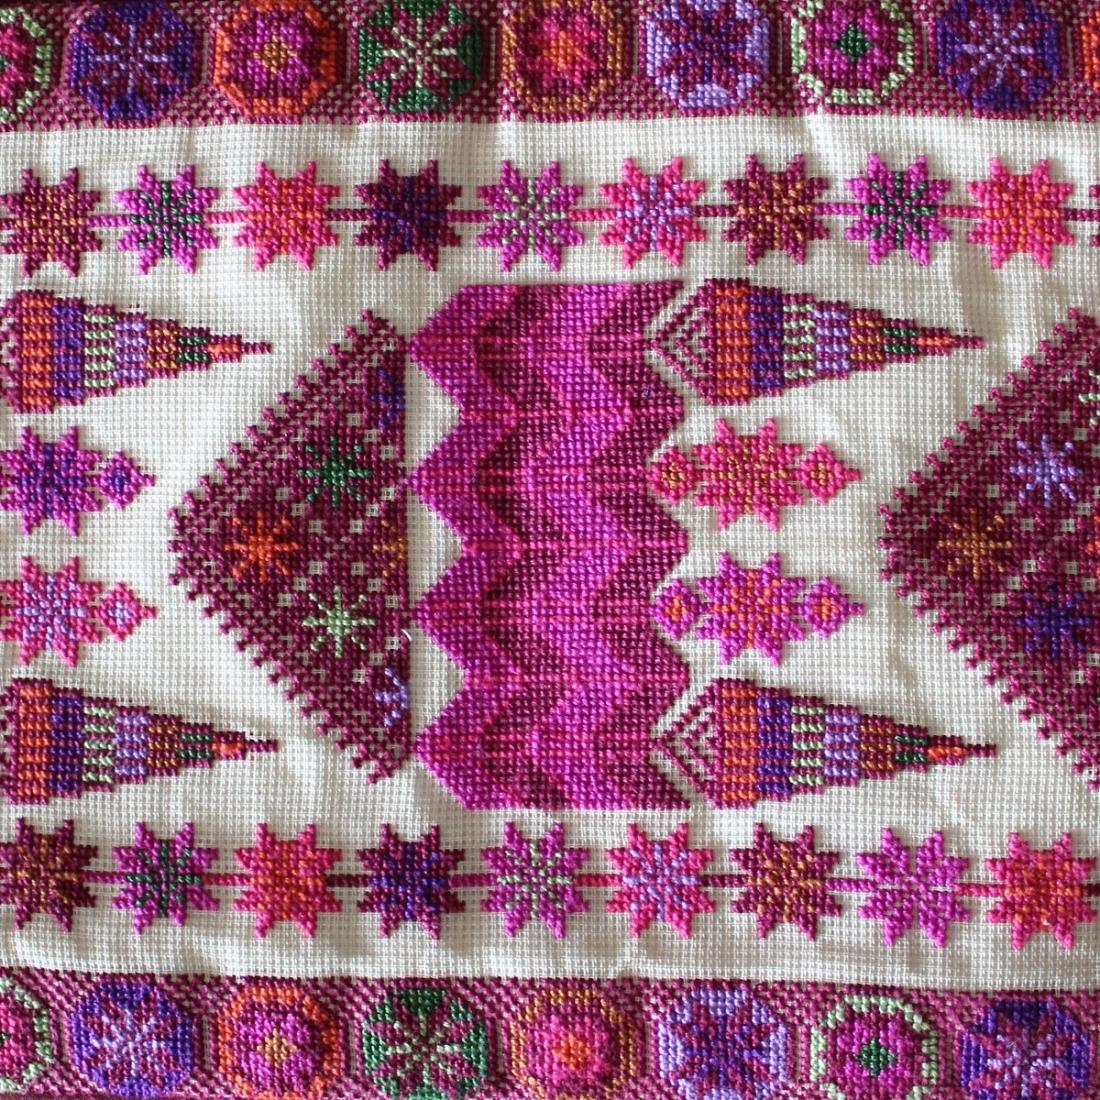 Palestinian Heritage handmade embroidered cushion